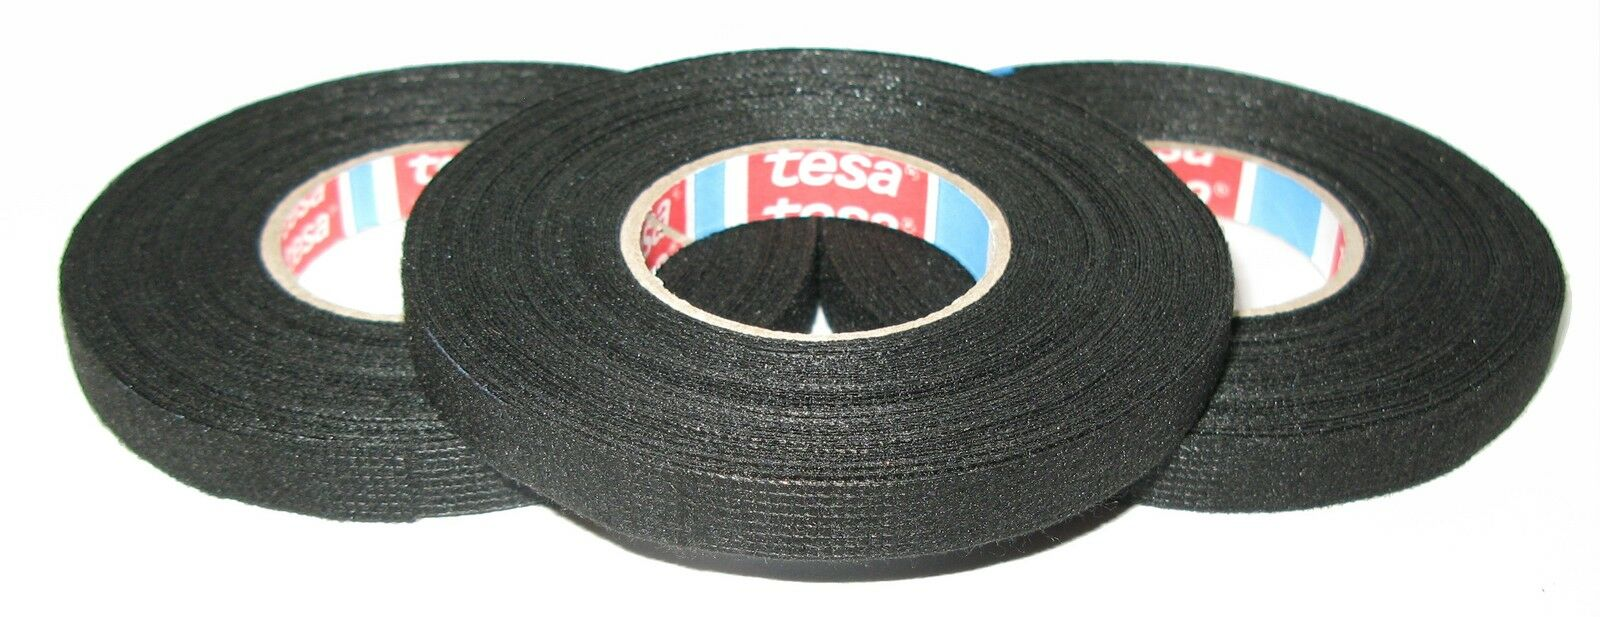 Vlies 51608 15mm x 25m Textilband Tape Klebeband MwSt 4x TESA kfz Gewebeband m